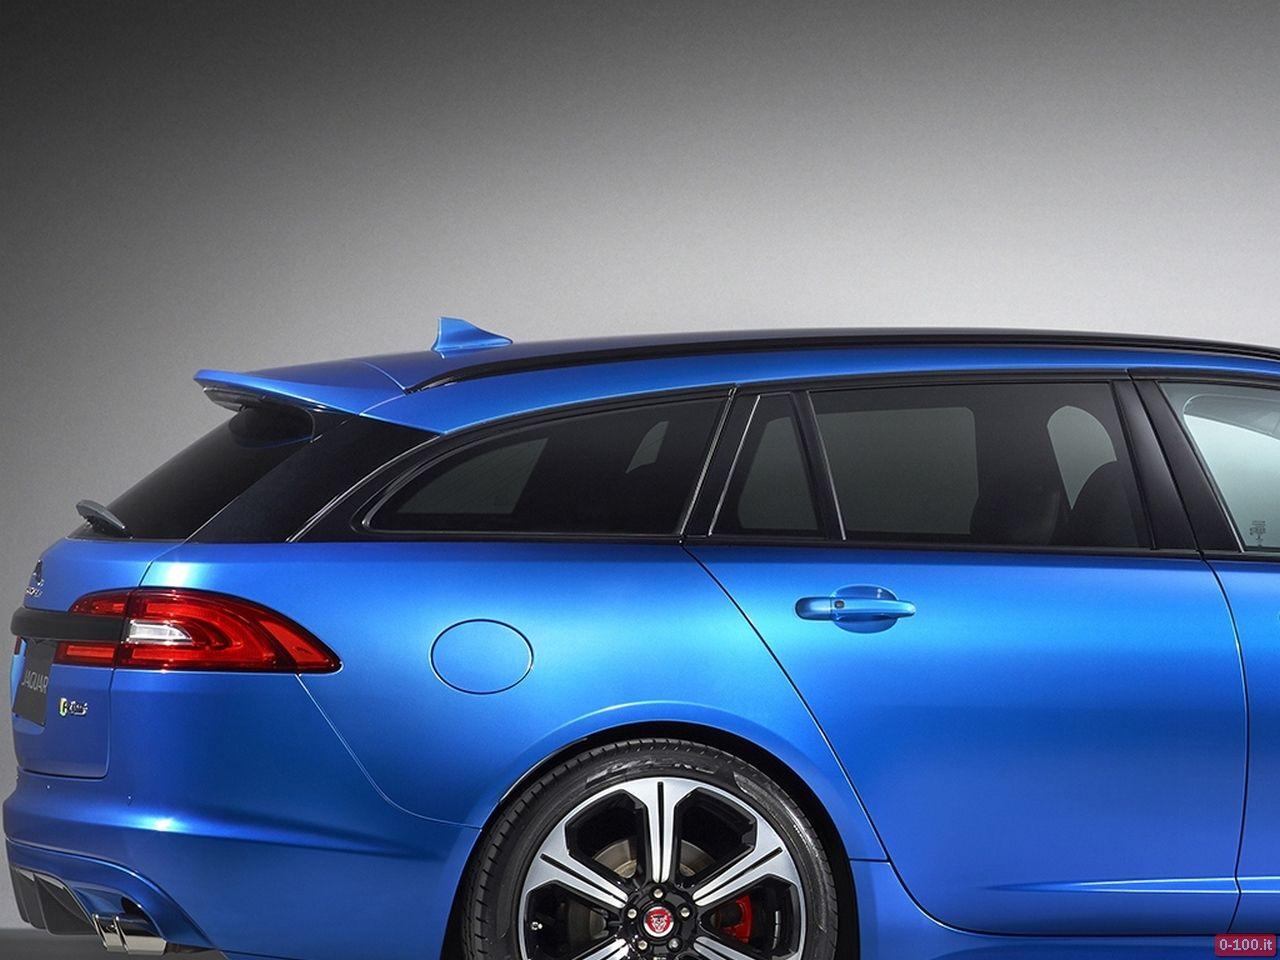 ginevra-2014-jaguar-xf-model-year-2015-xfr-s-sportbrake-0-100_38